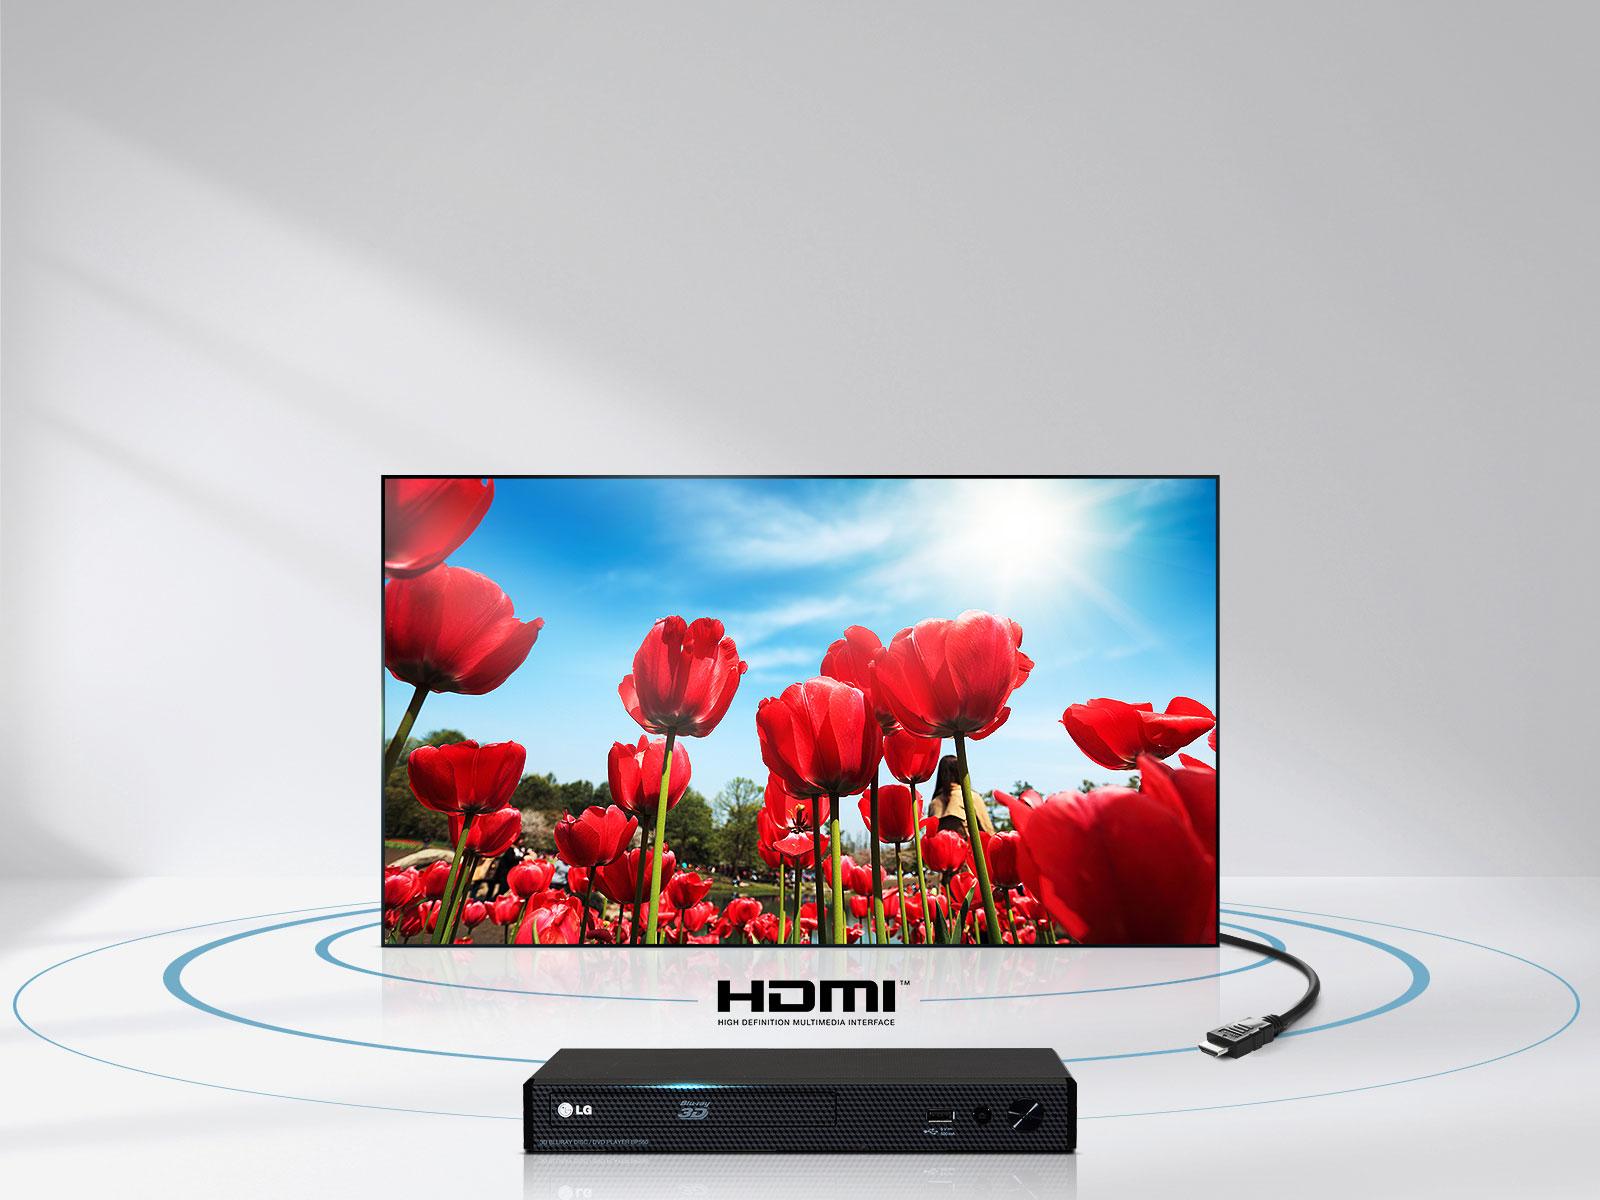 07_49_43LJ51_D_HDMI_09072017_Desktop